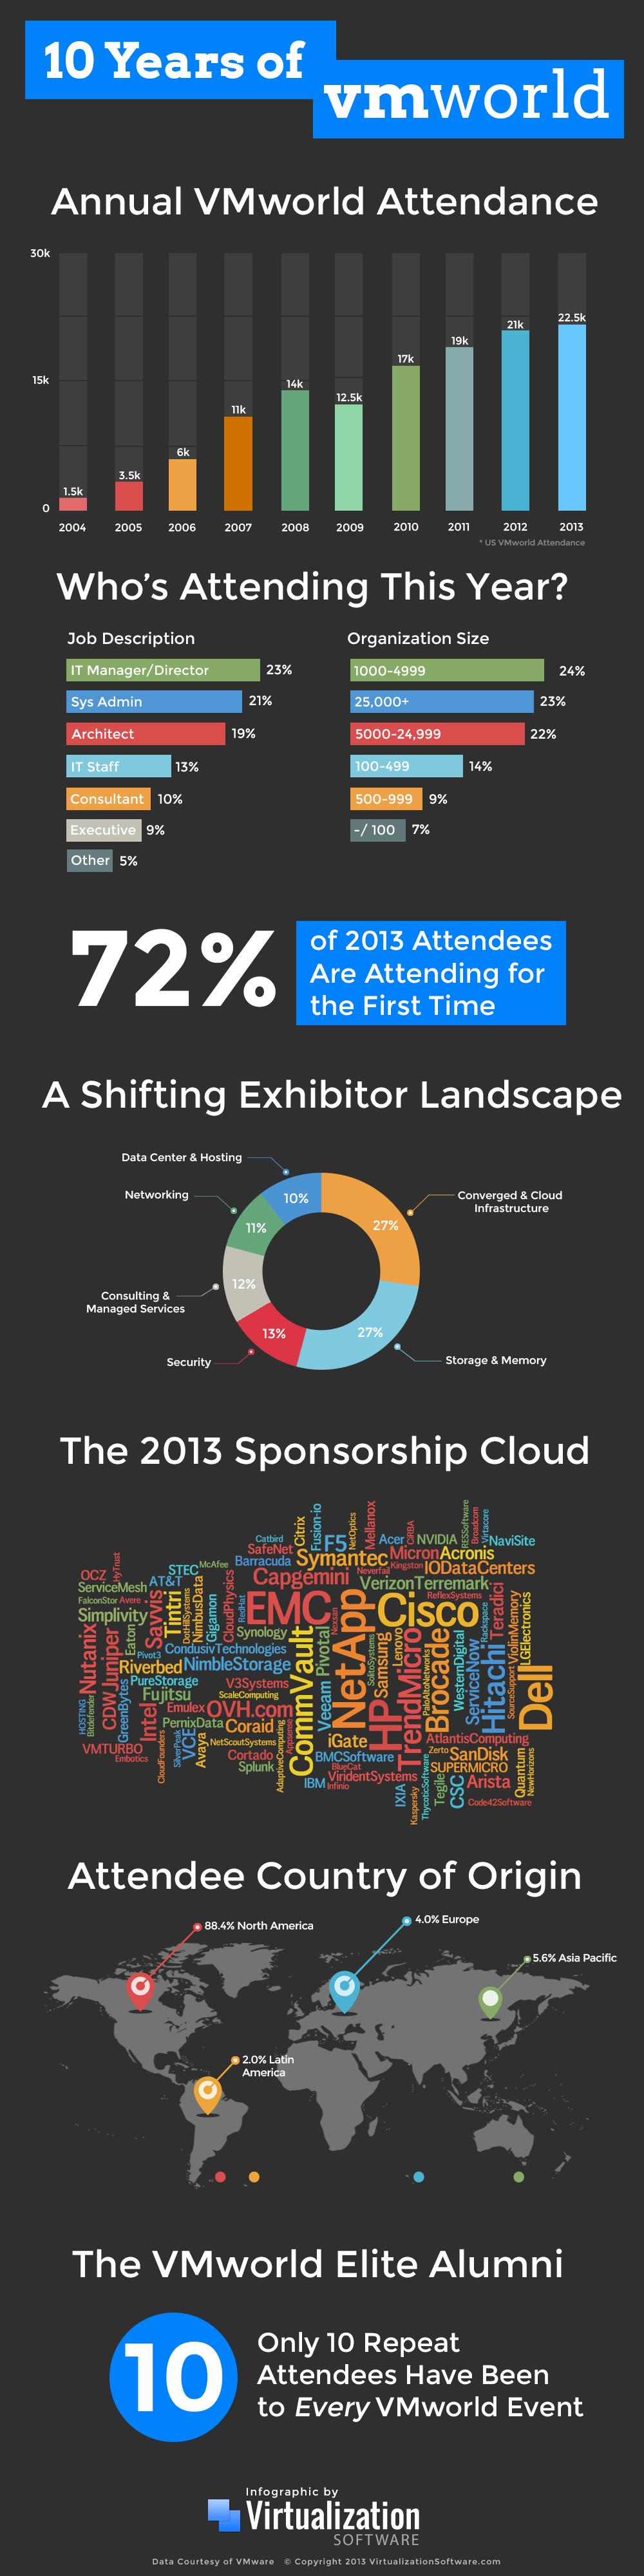 VMworld 2013 Infographic